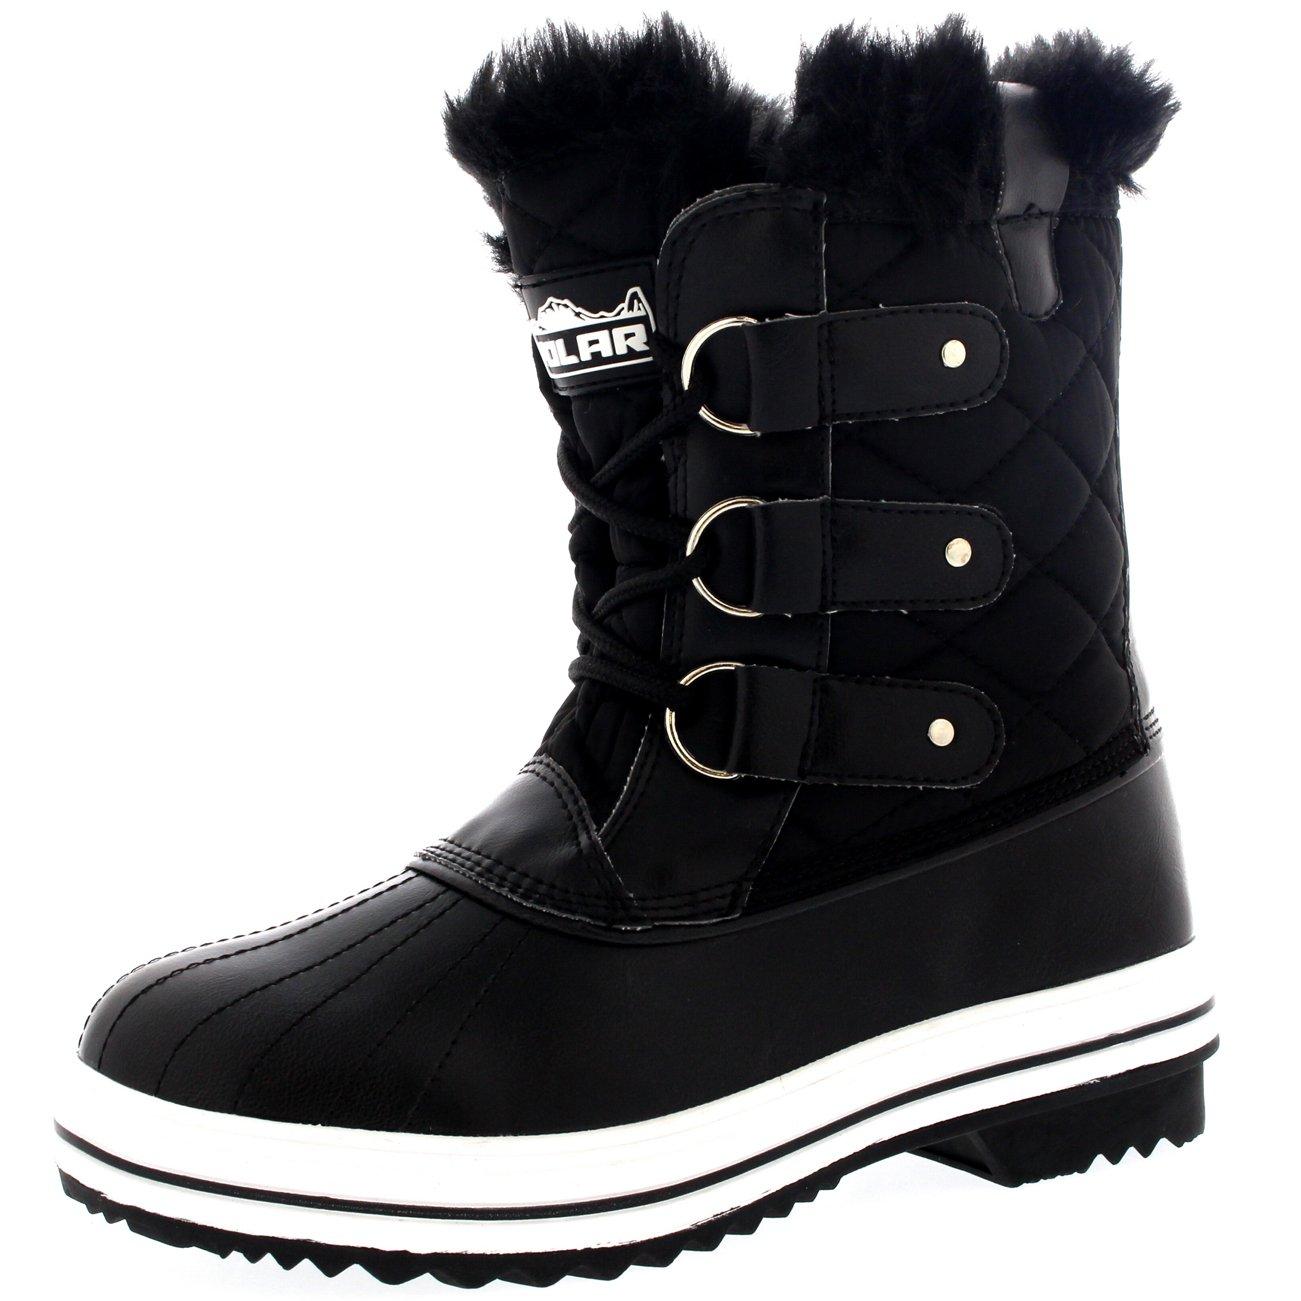 Polar Products Womens Snow Boot Nylon Short Winter Snow Fur Rain Warm Waterproof Boots - Black - 9-40 - ACD0030